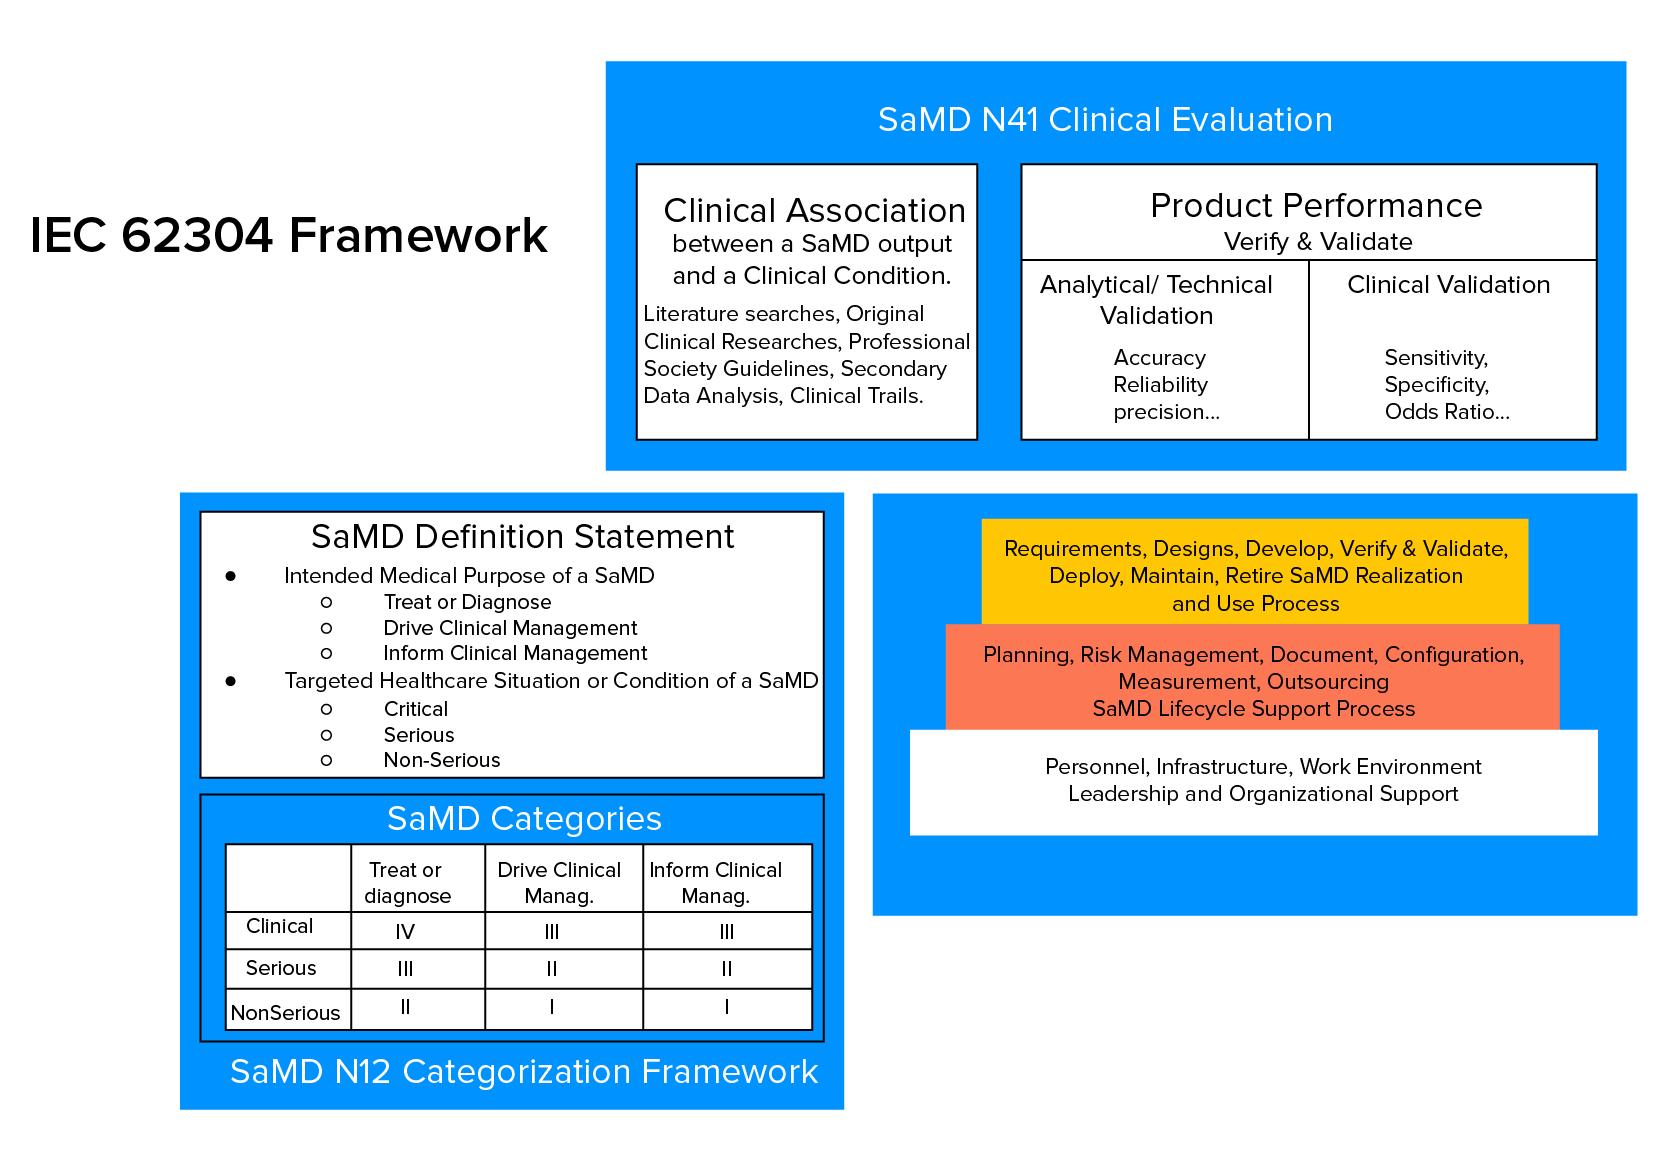 IEC 62304 Framework